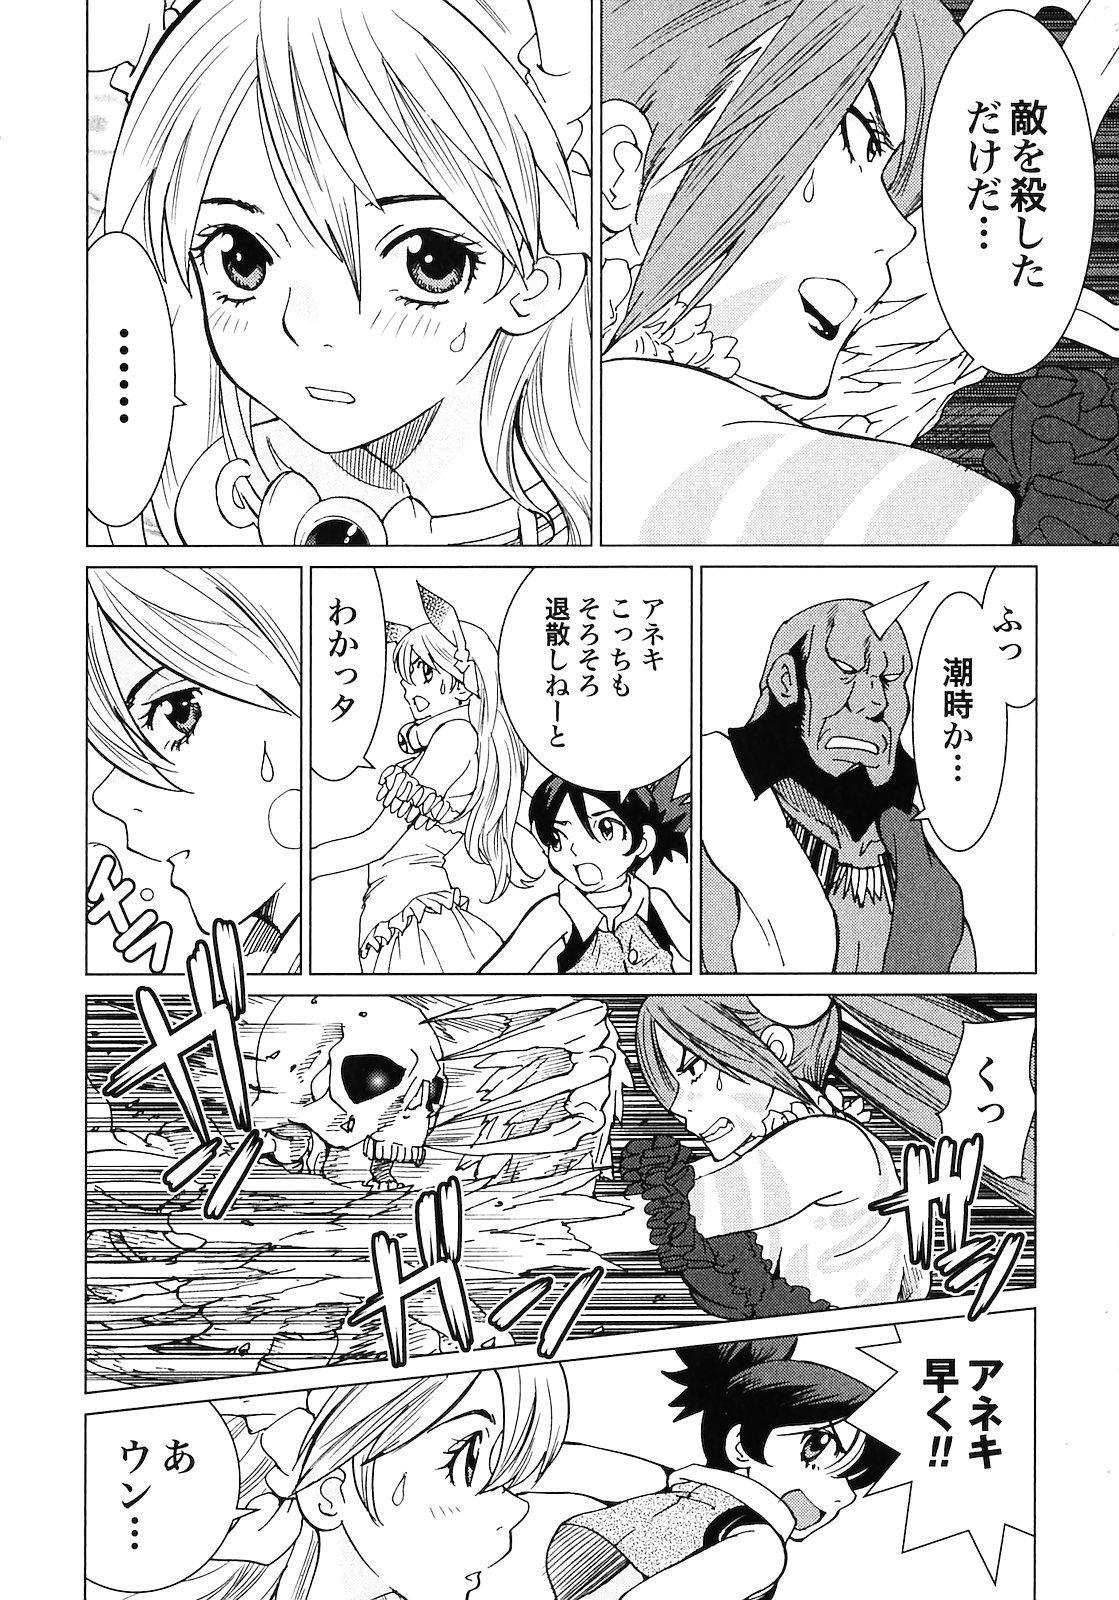 Makyo no Shanana Vol.02 169